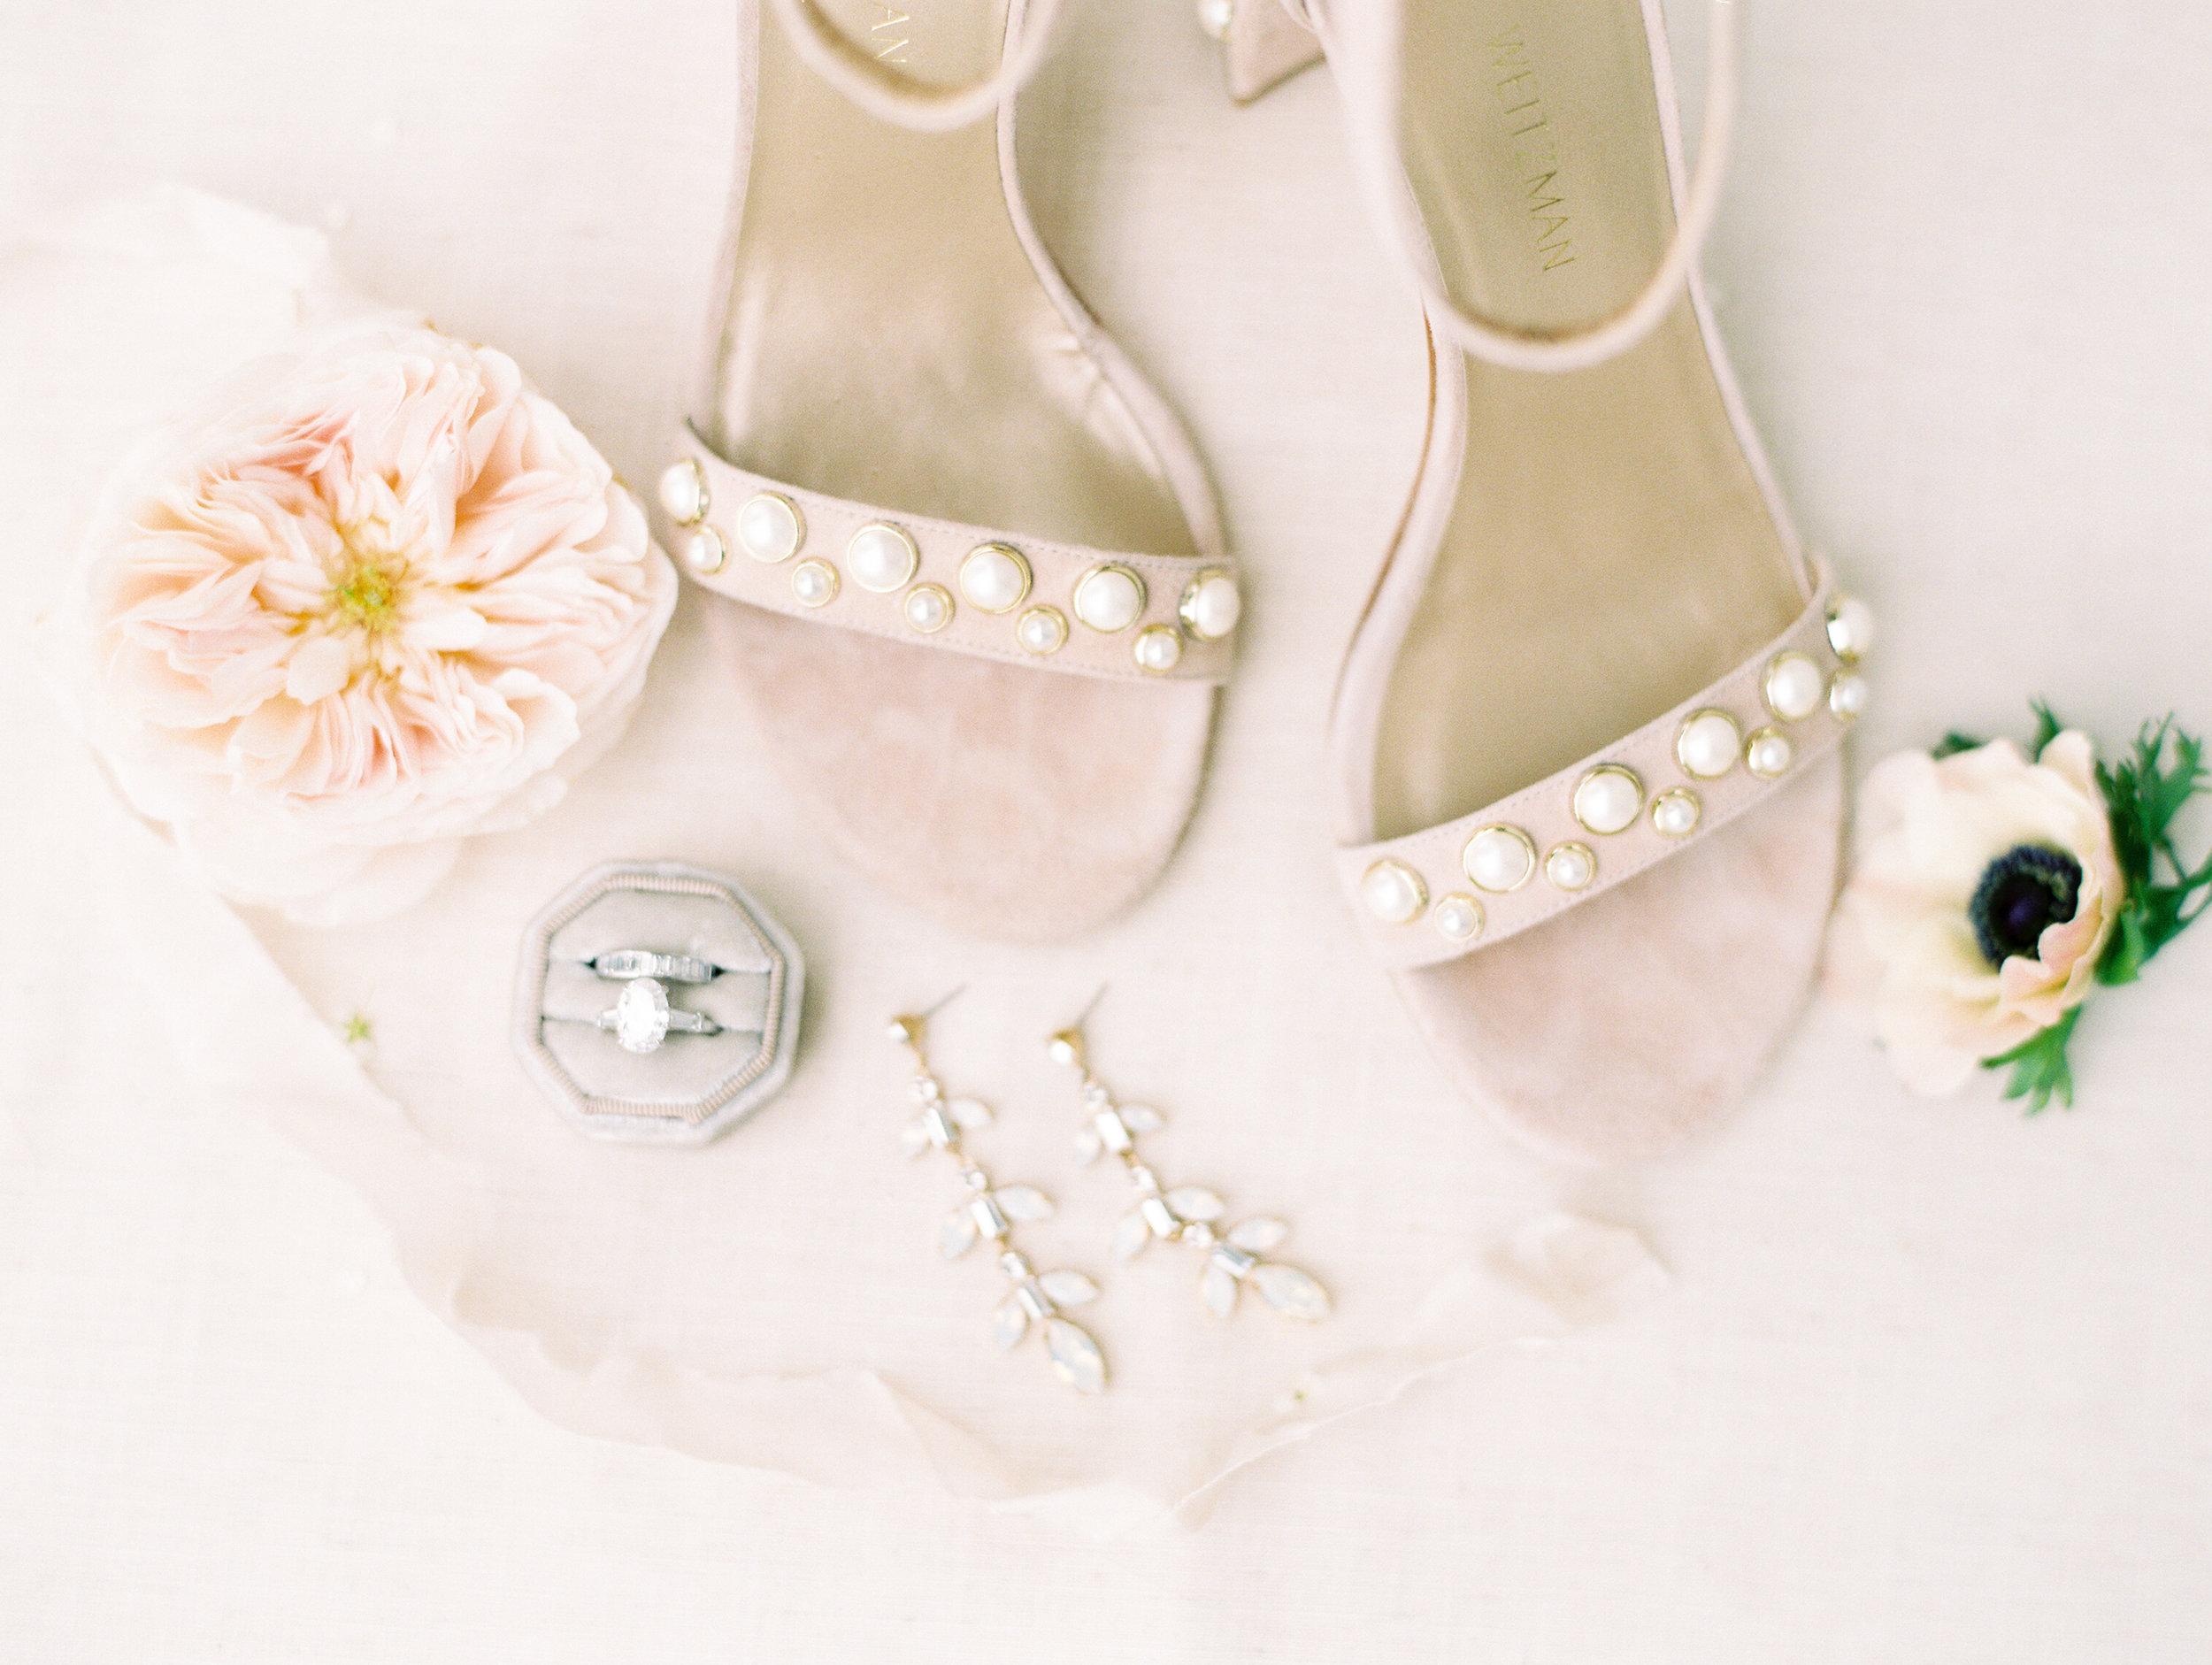 Coffman+Wedding+Details-59.jpg